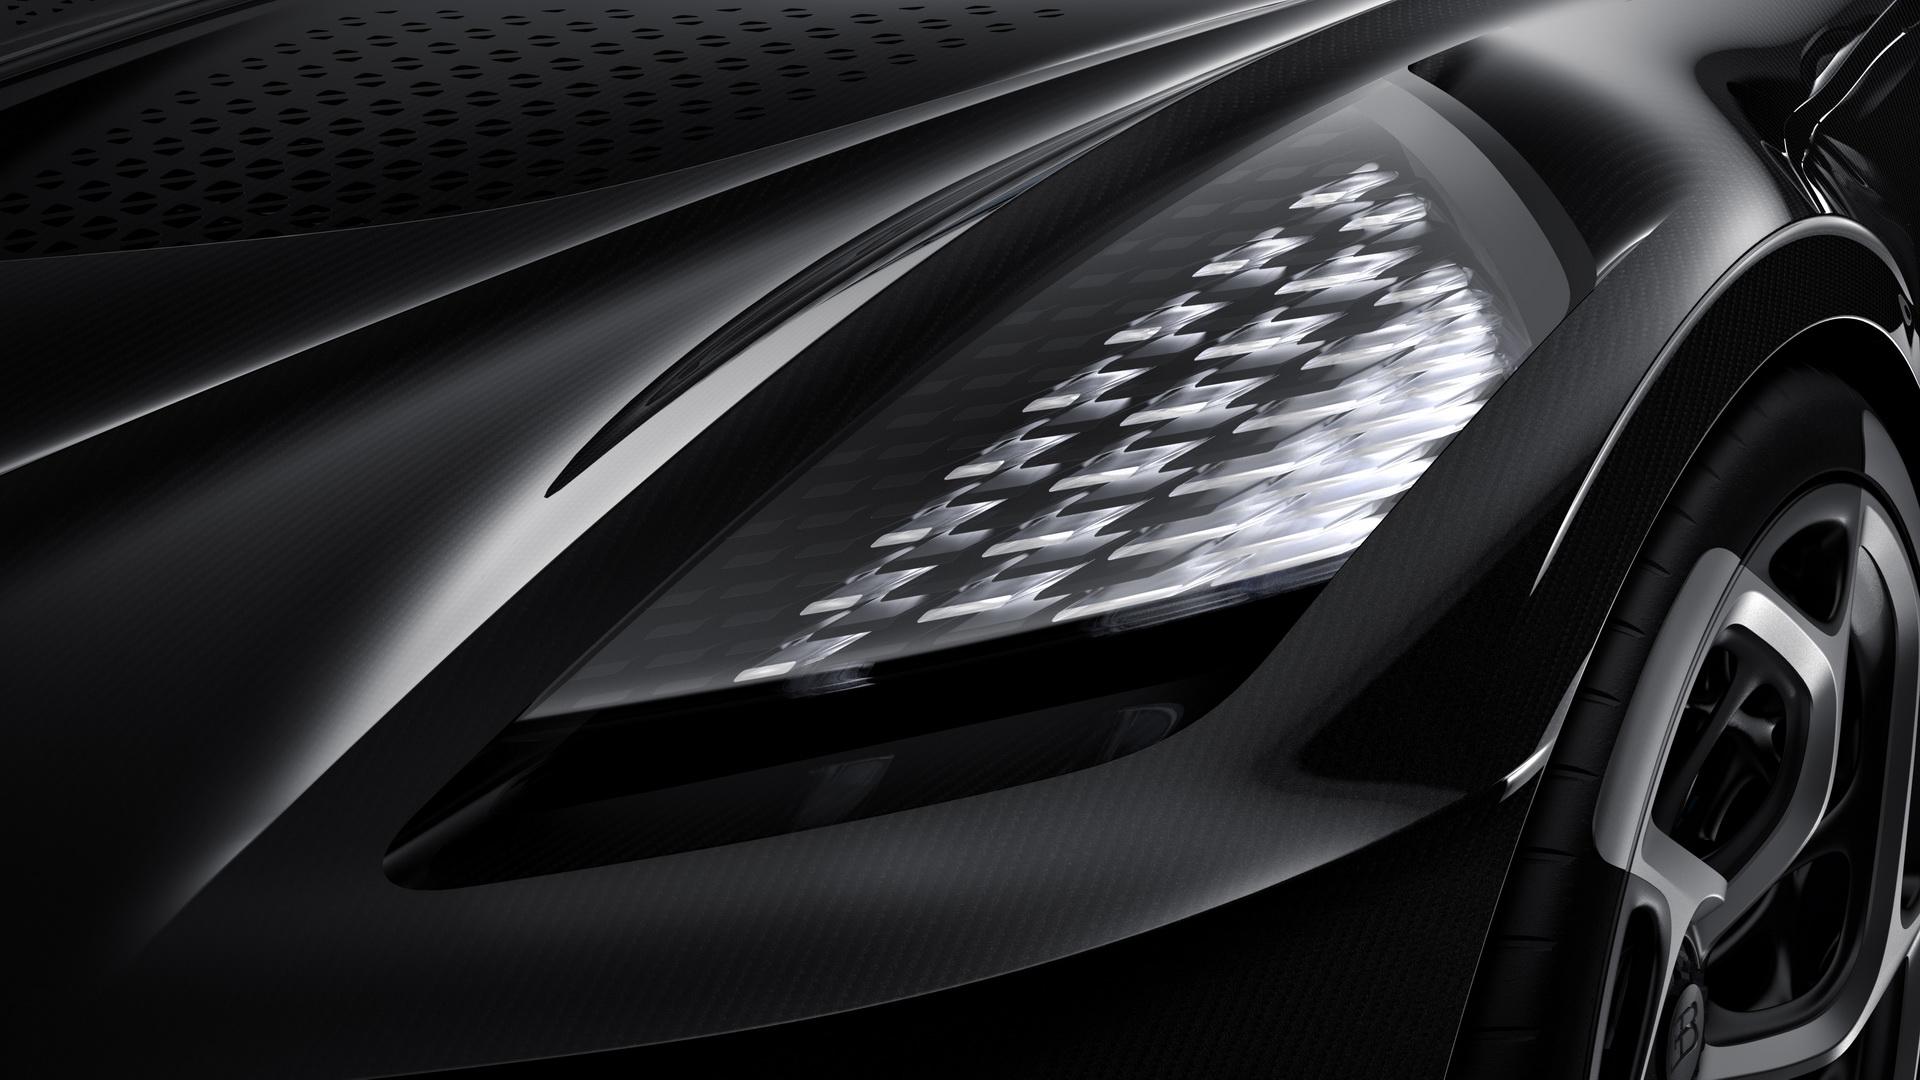 073039c4-2019-bugatti-la-voiture-noire-7.jpg